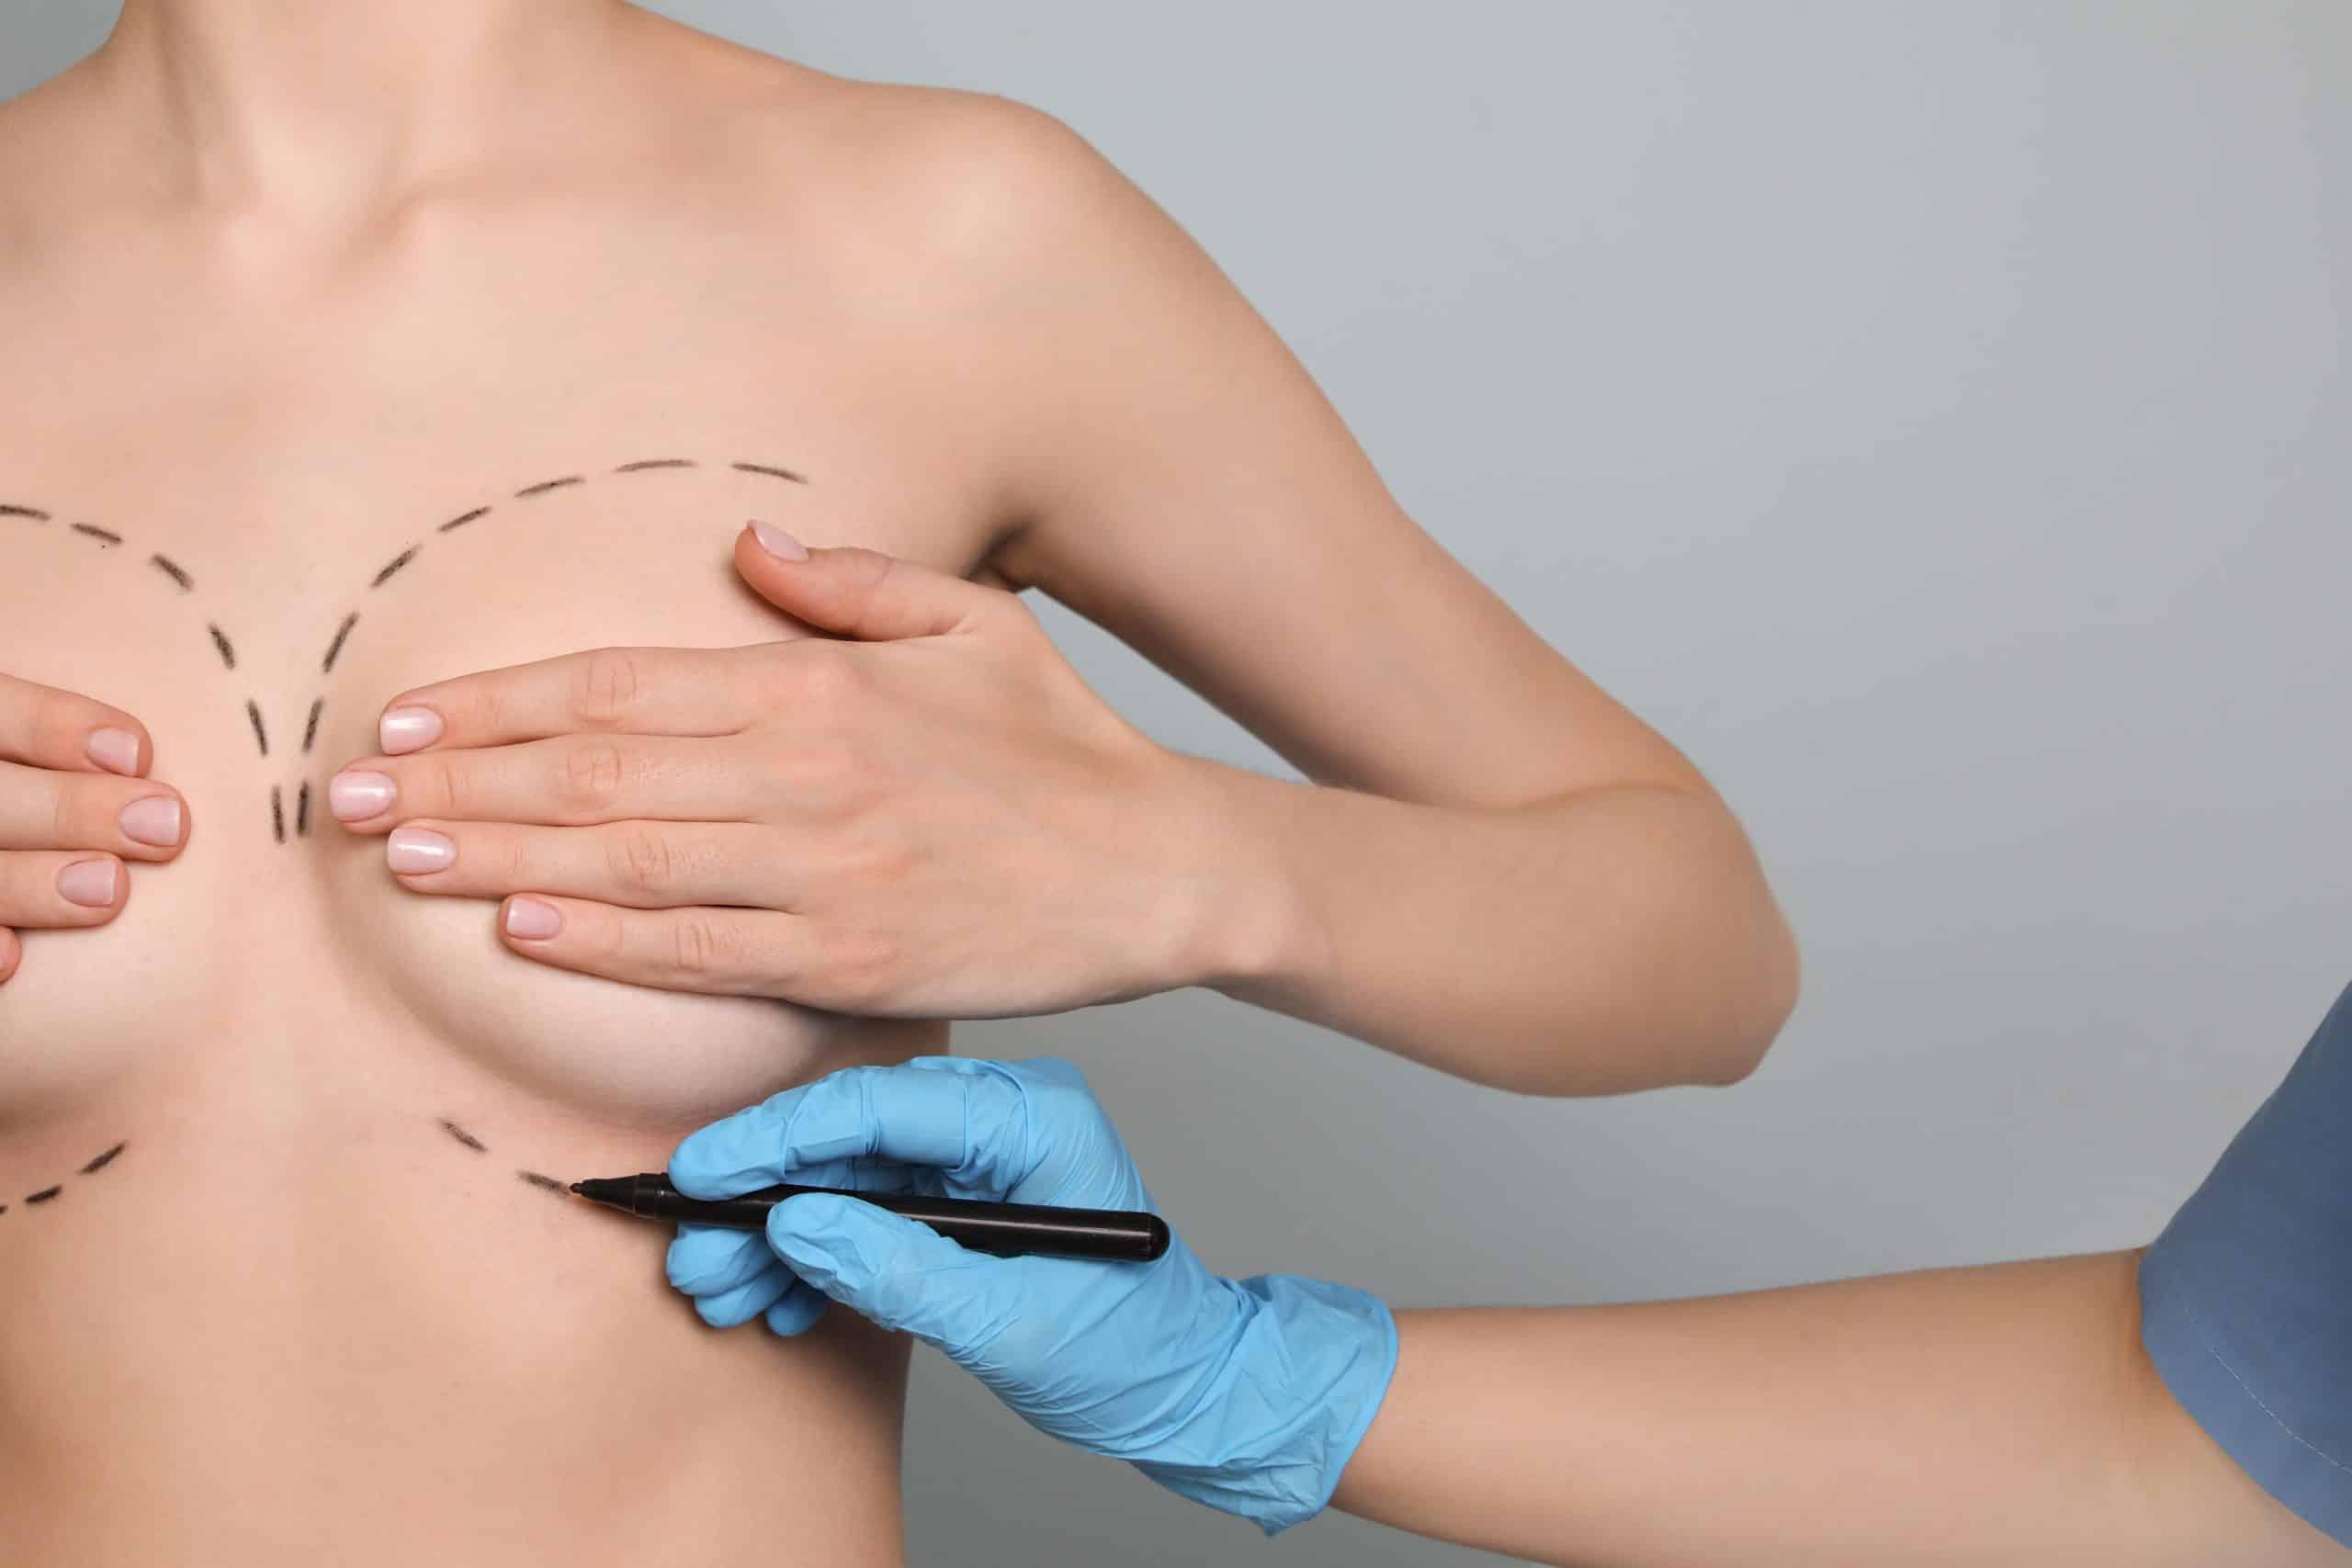 operacion aumento de pecho